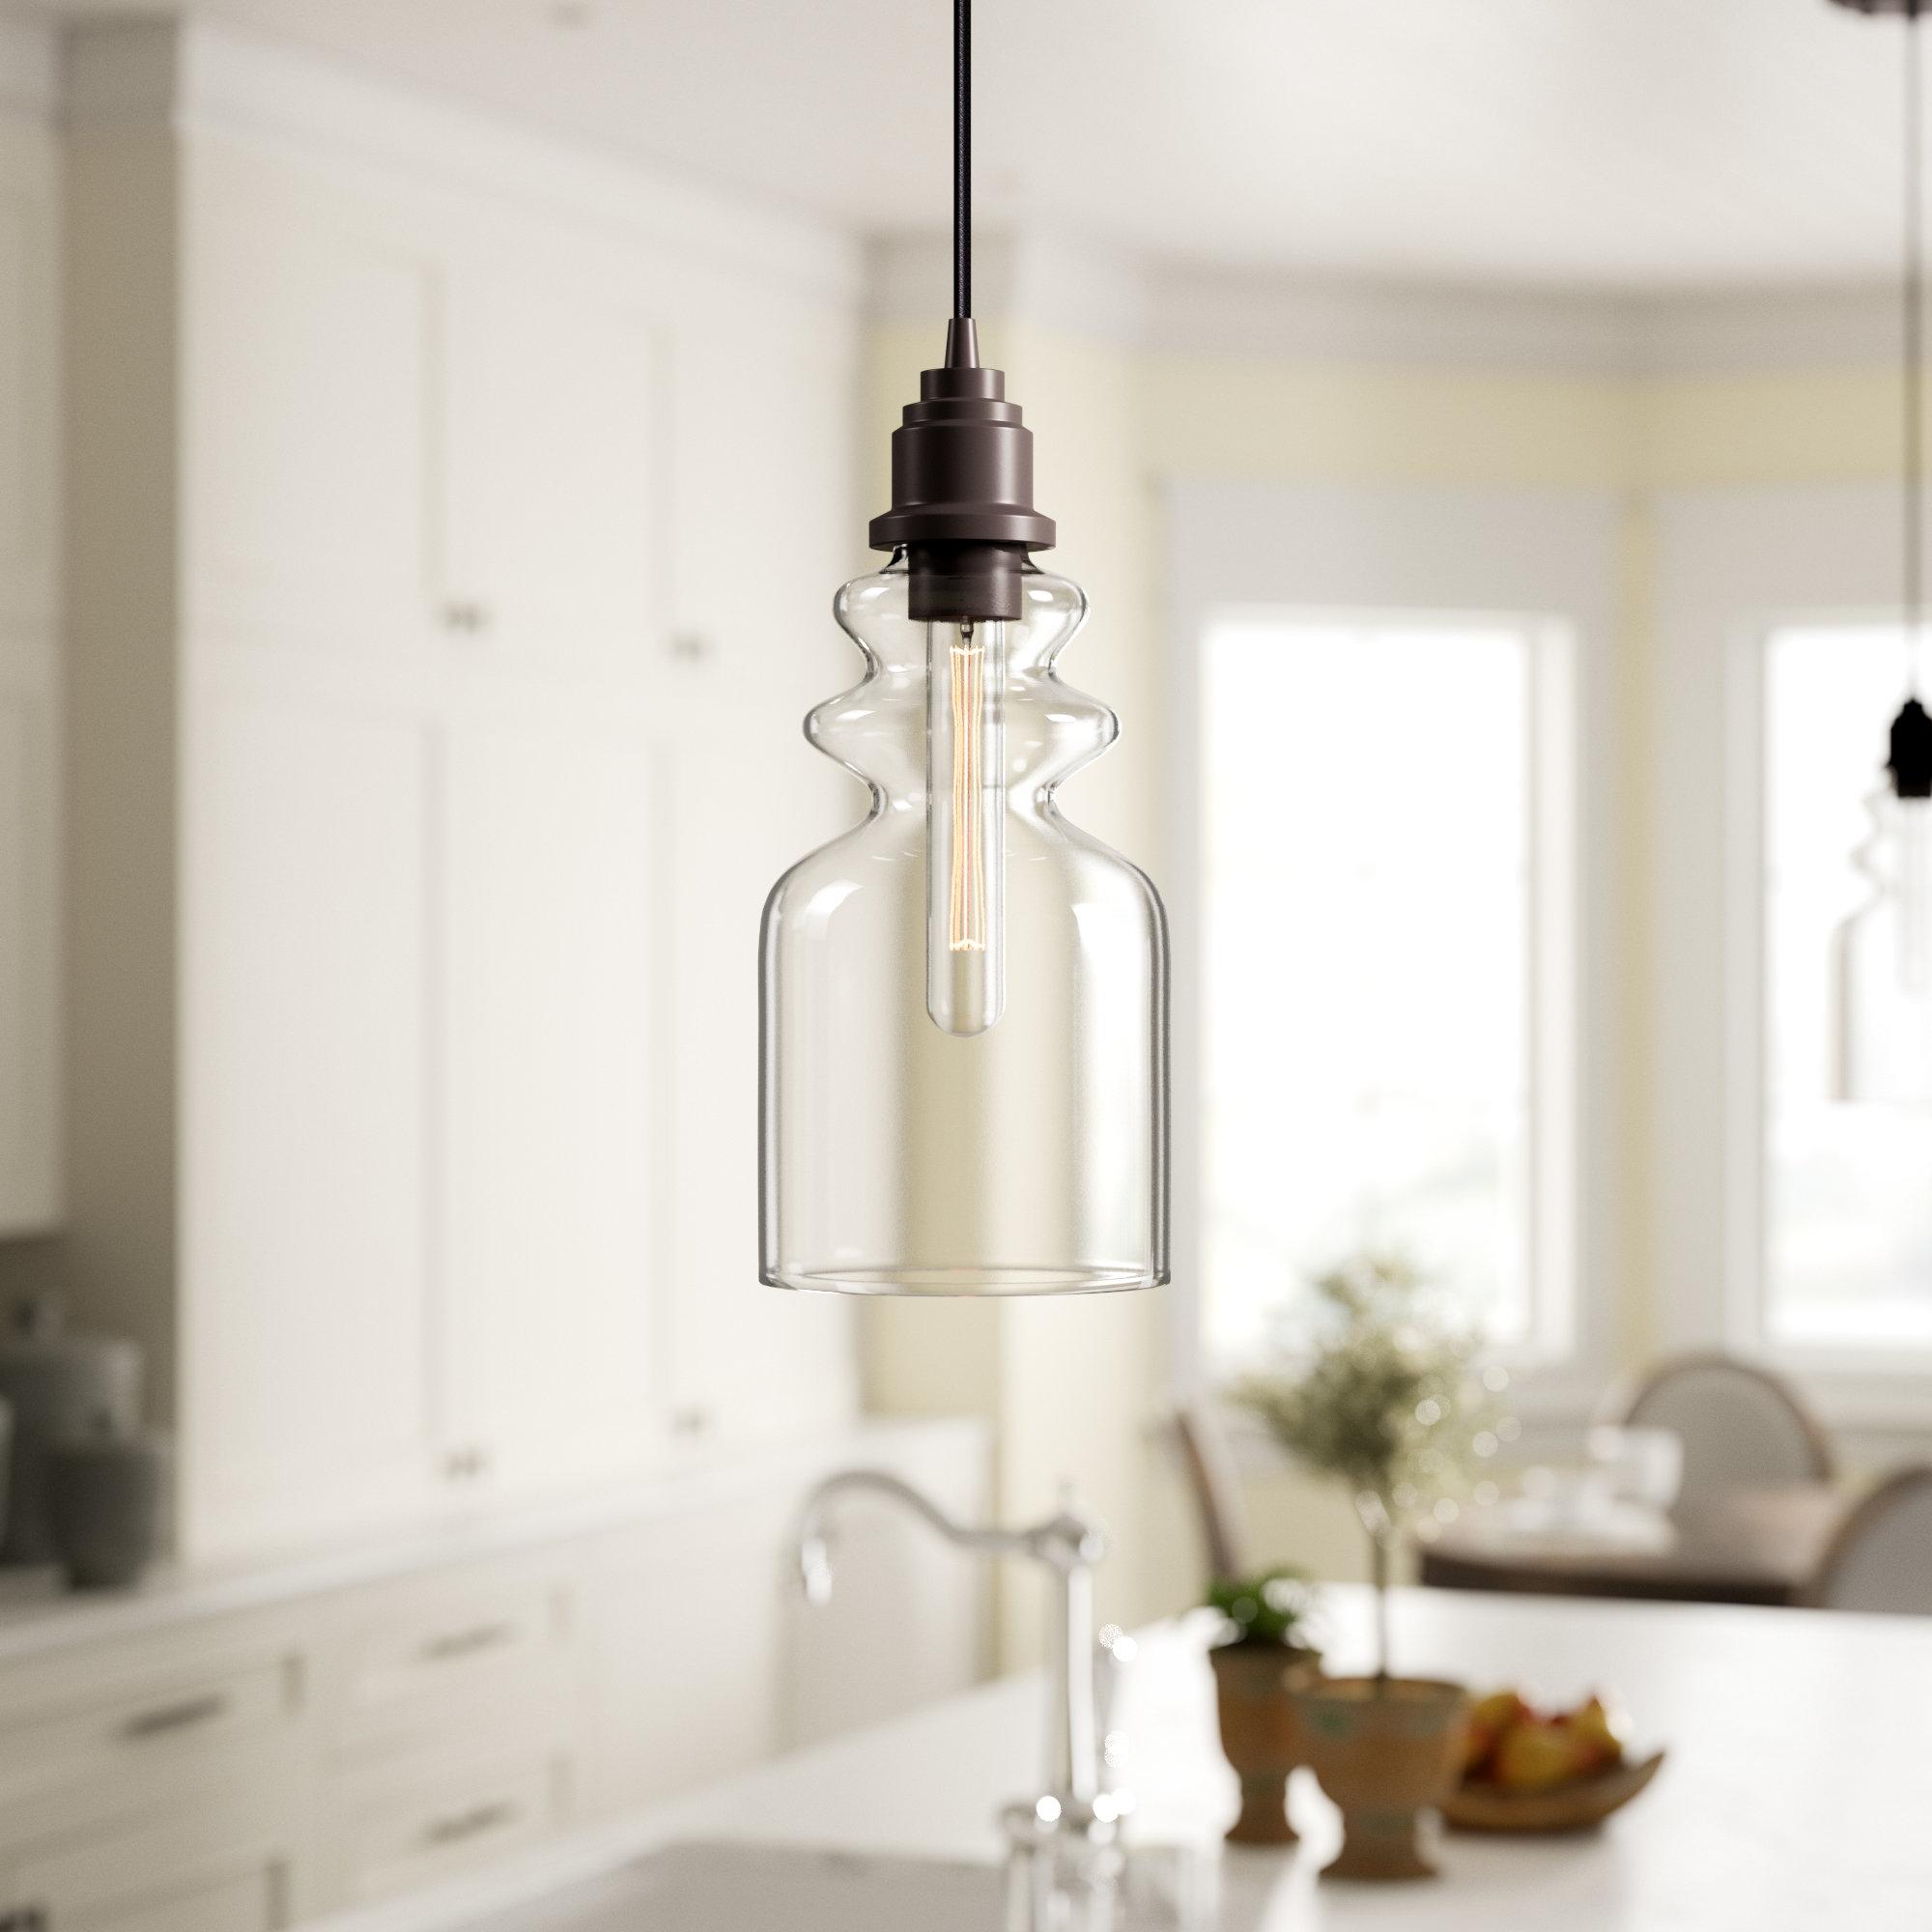 Favorite Giacinta 1 Light Single Bell Pendants Throughout Wyckoff 1 Light Bell Pendant (View 8 of 25)